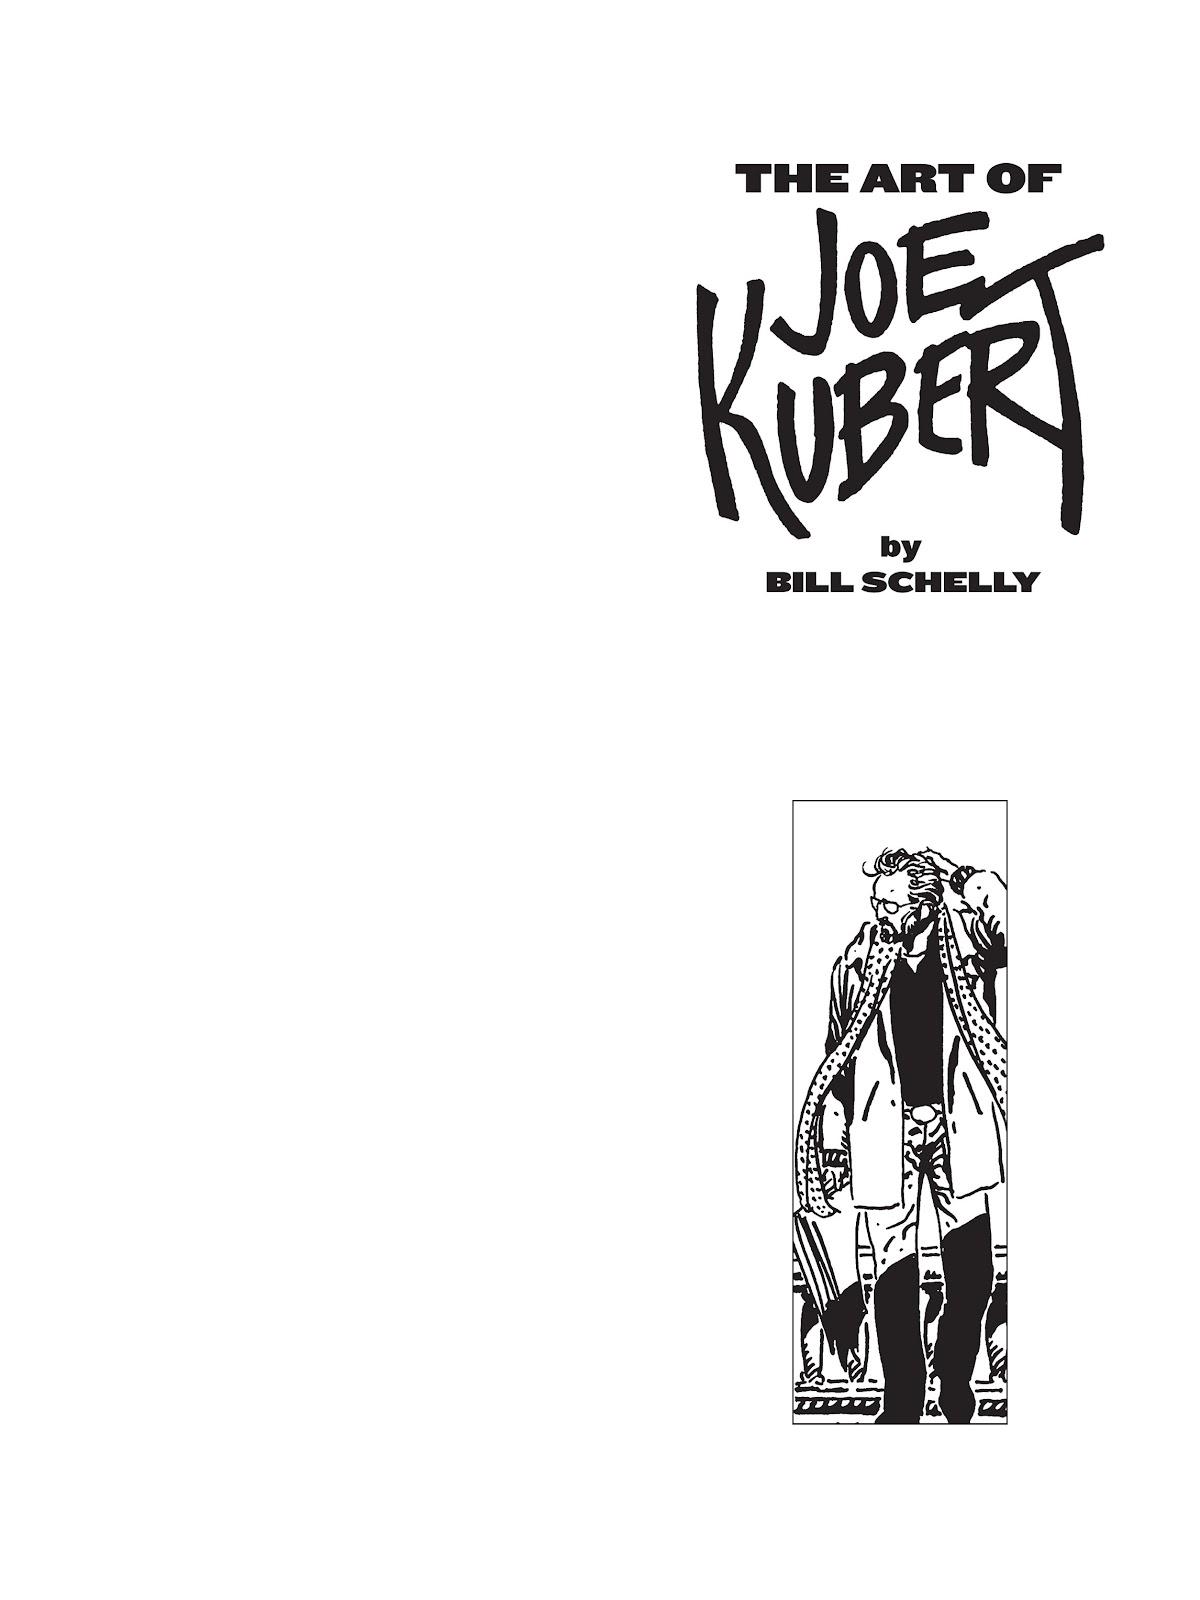 Read online The Art of Joe Kubert comic -  Issue # TPB (Part 1) - 2